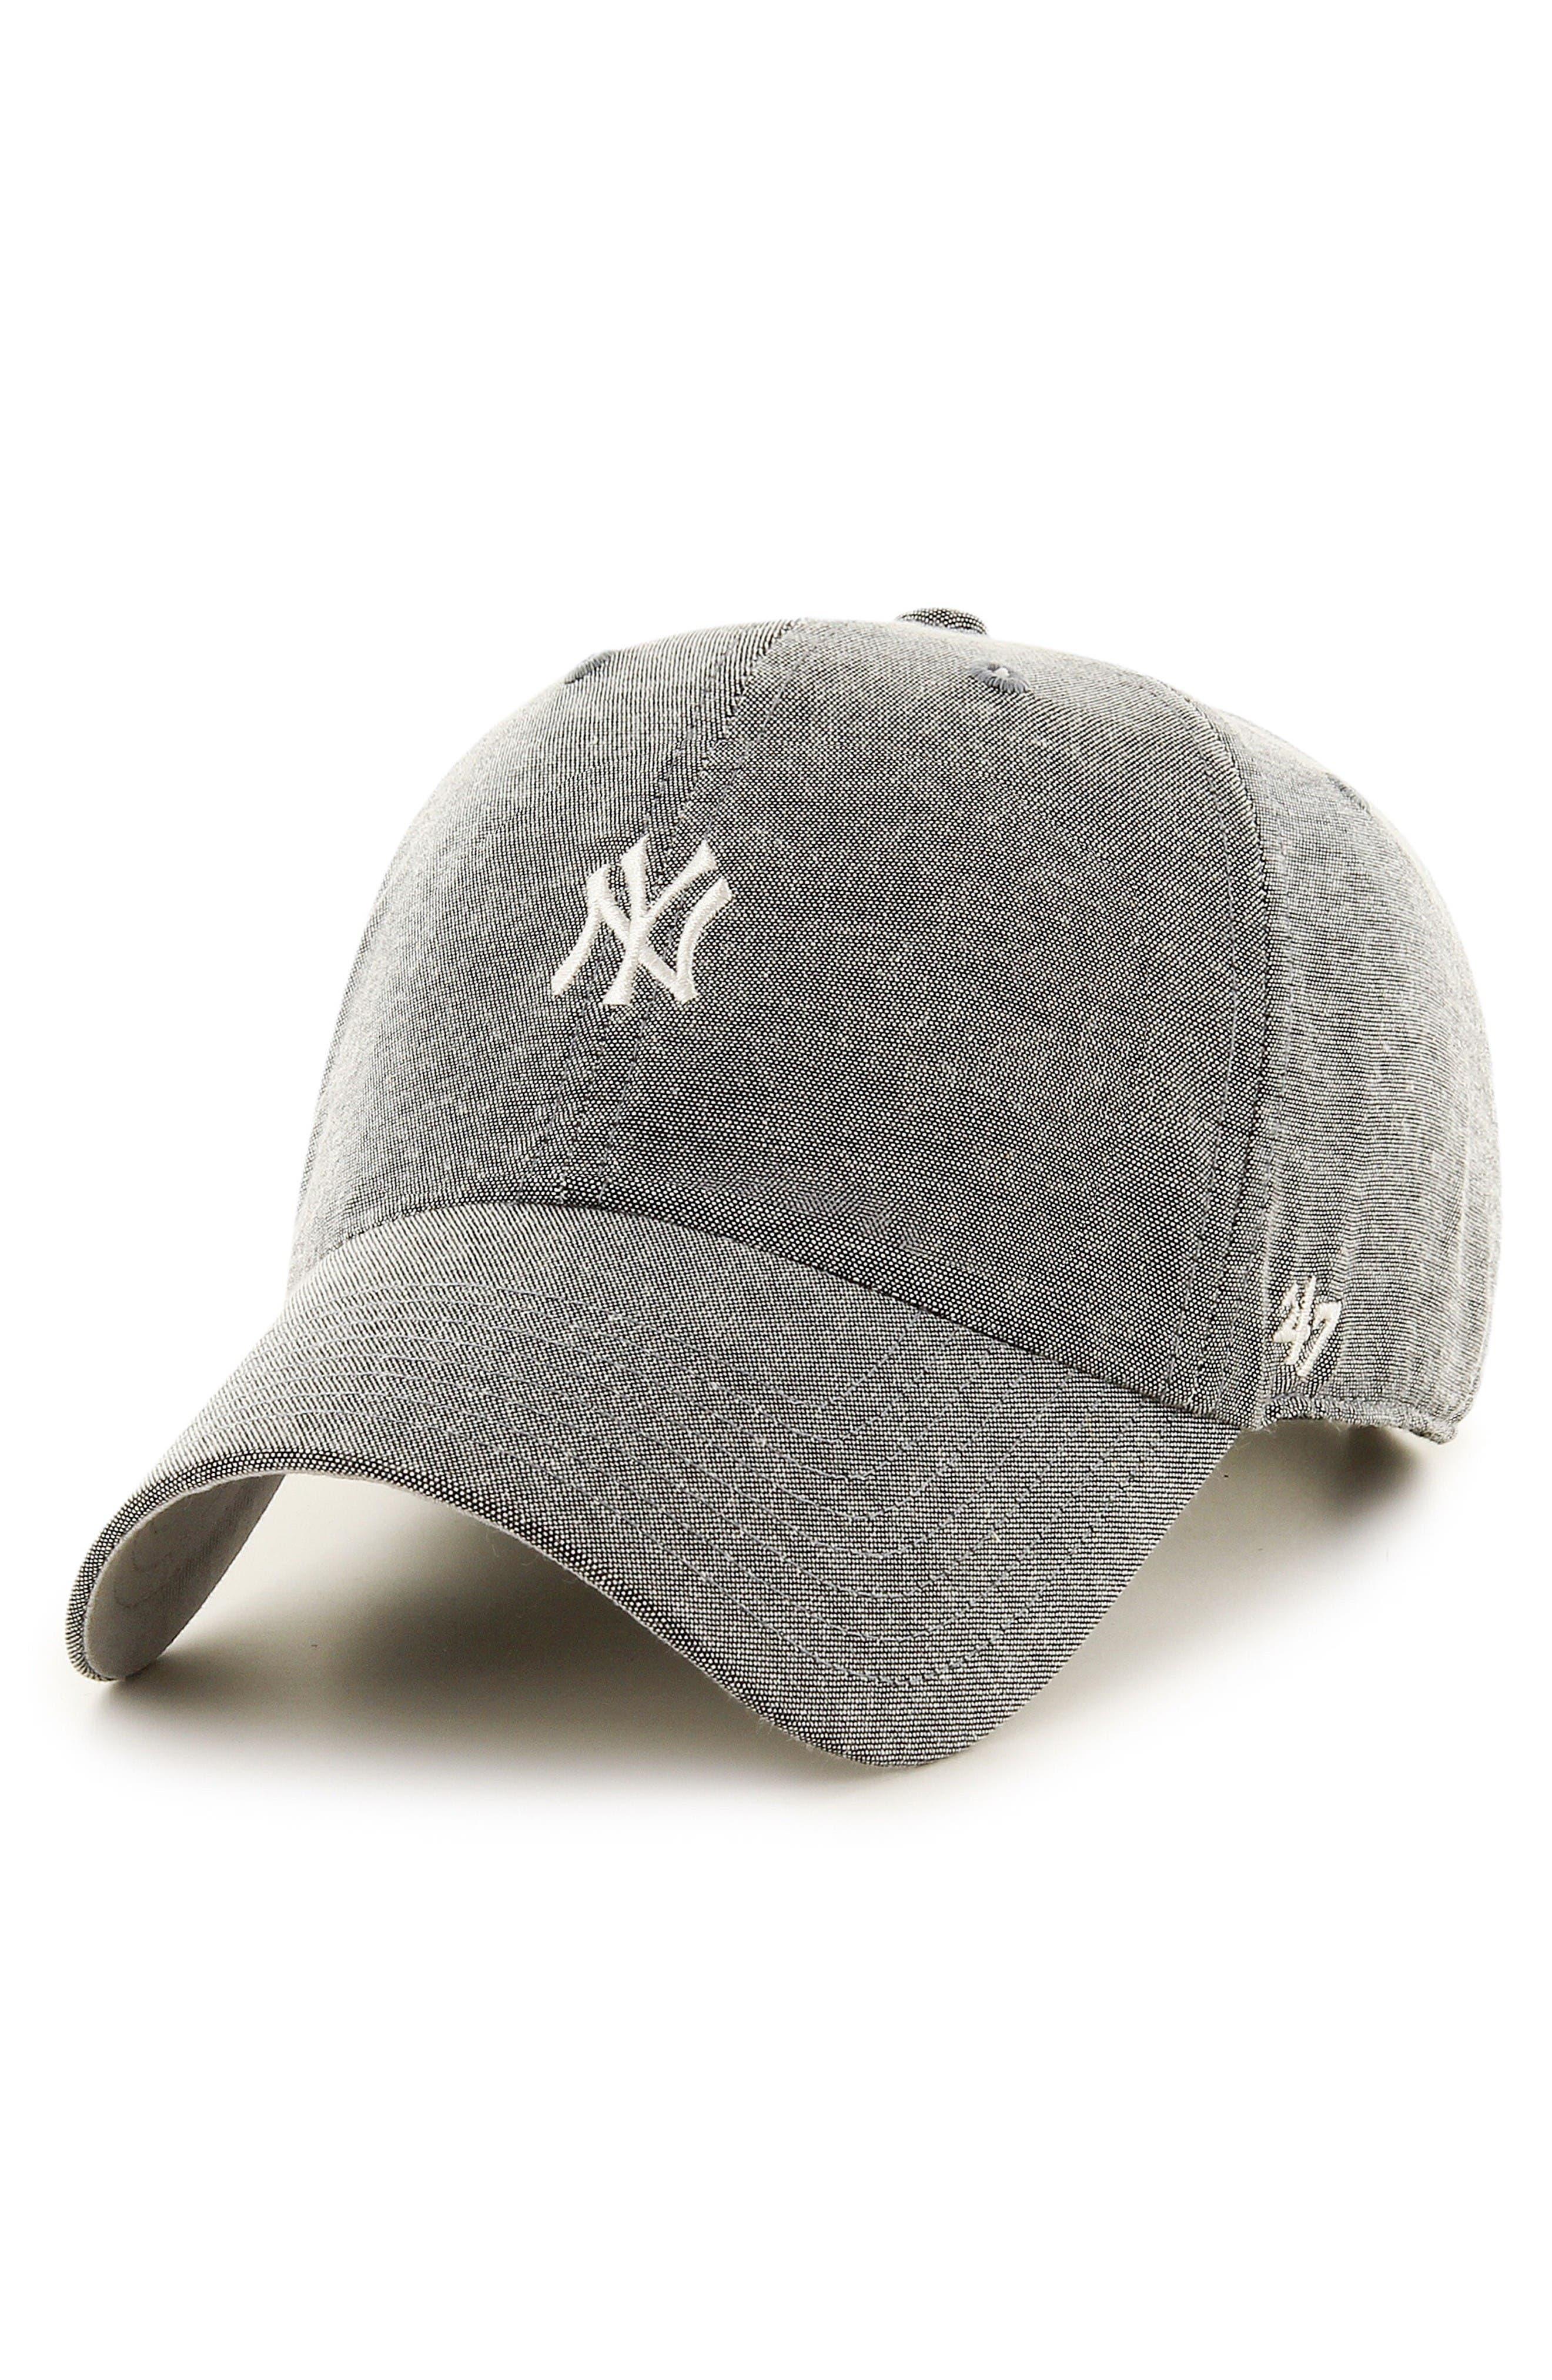 Monument Salute Clean Up NY Yankees Baseball Cap,                         Main,                         color, Gray